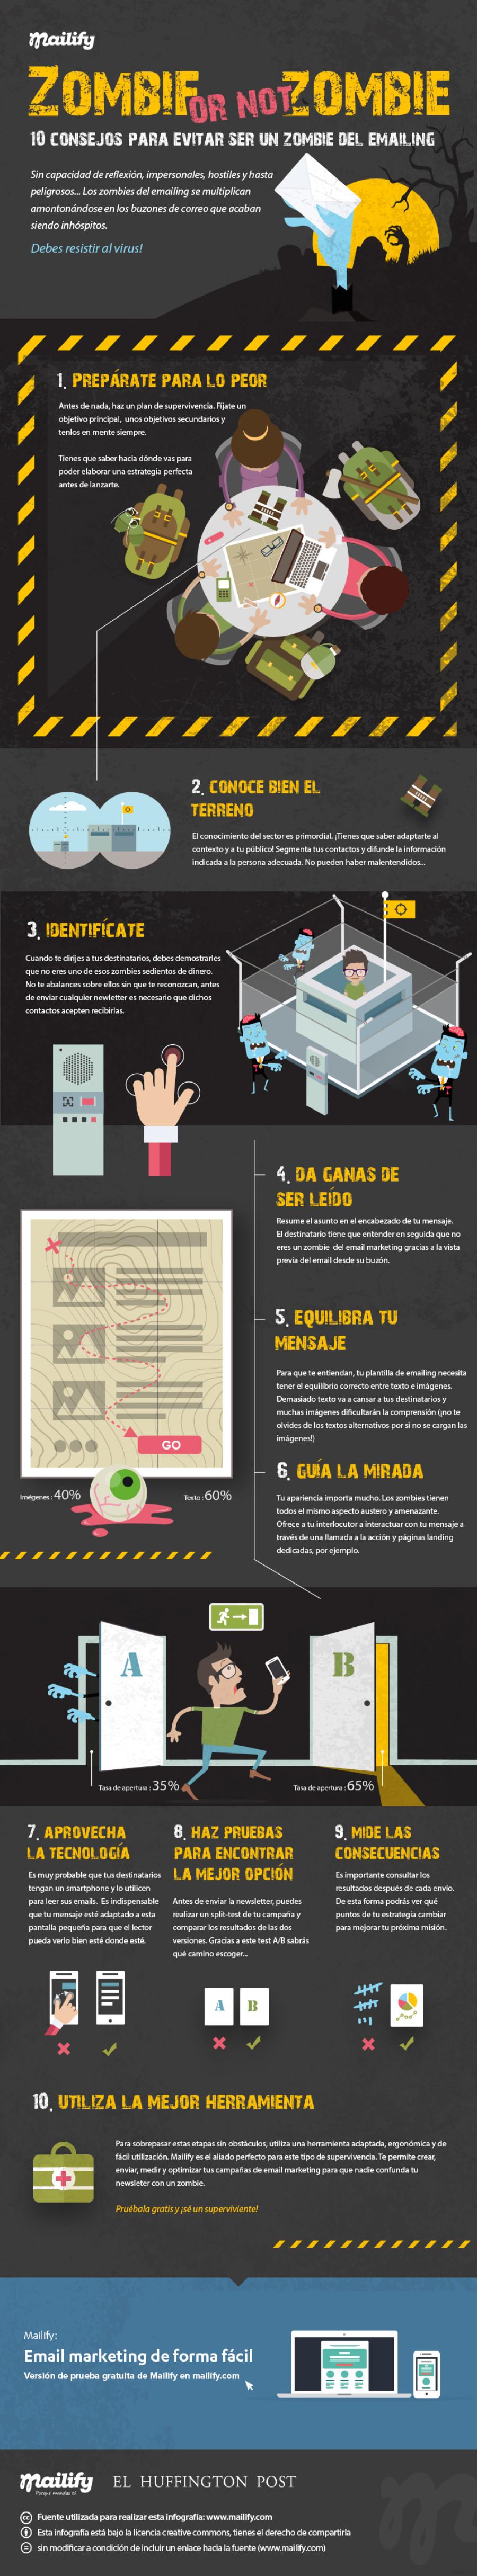 infografía zombie